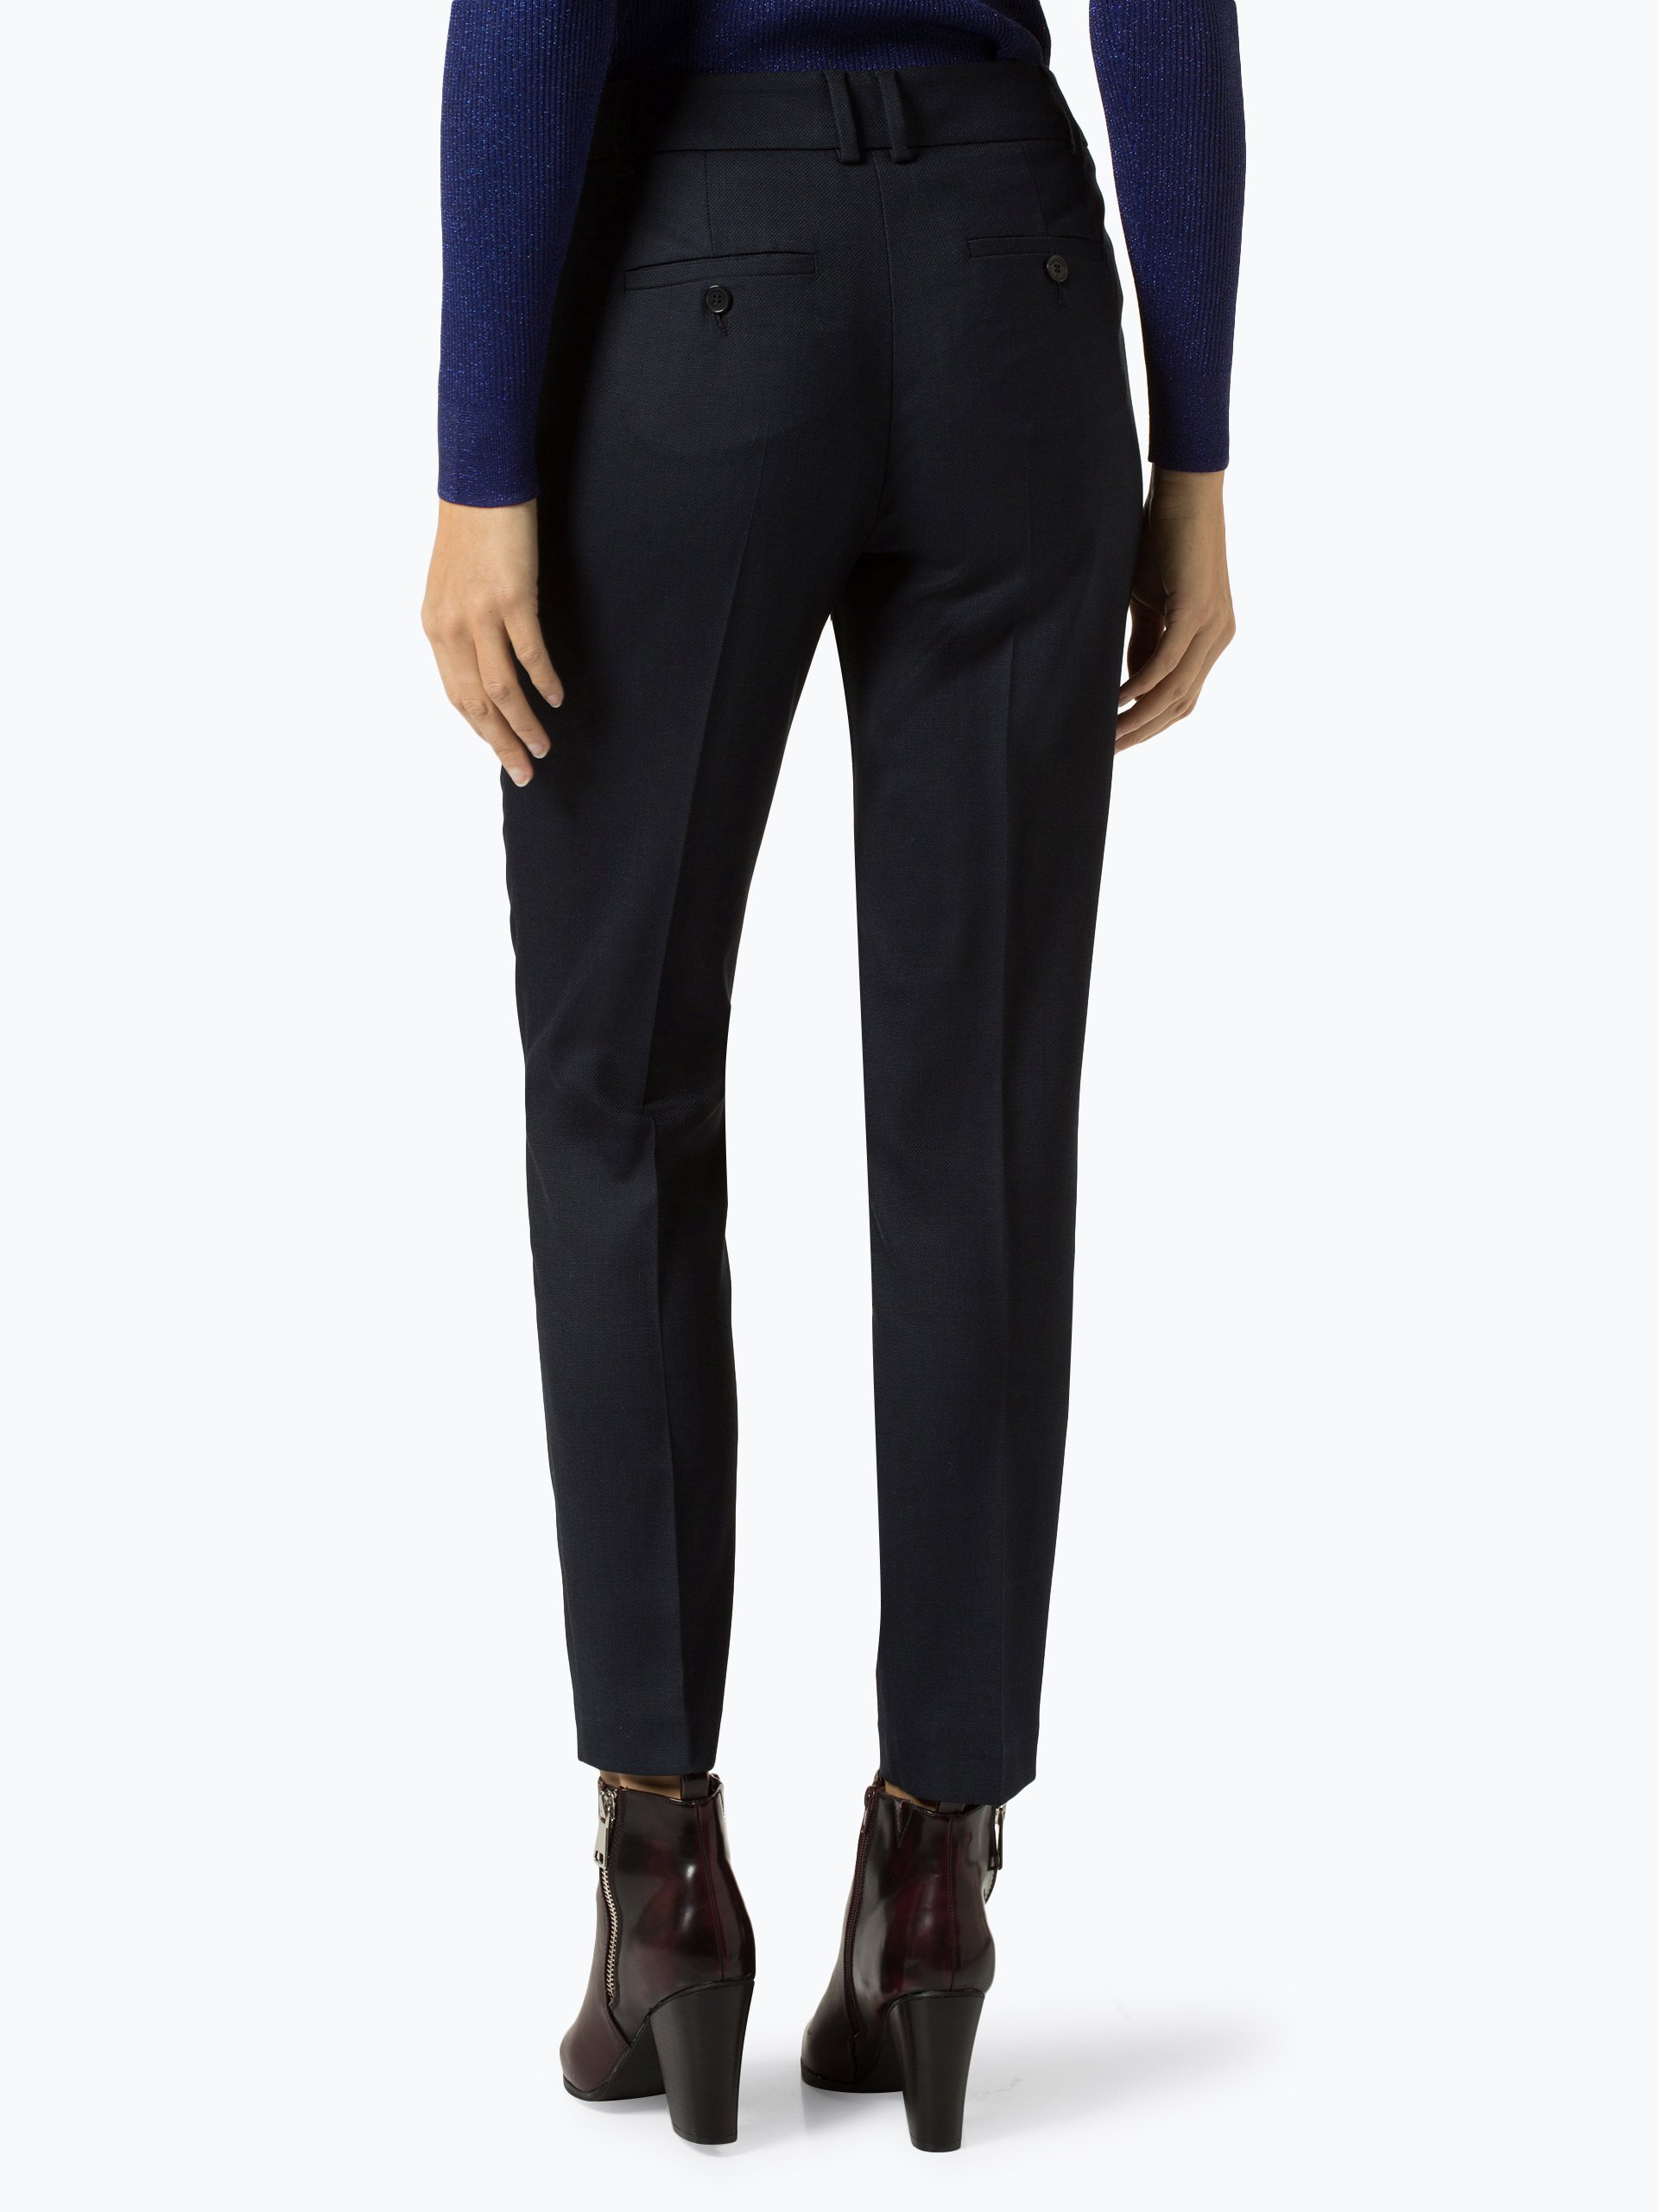 Apriori Spodnie damskie – Coordinates